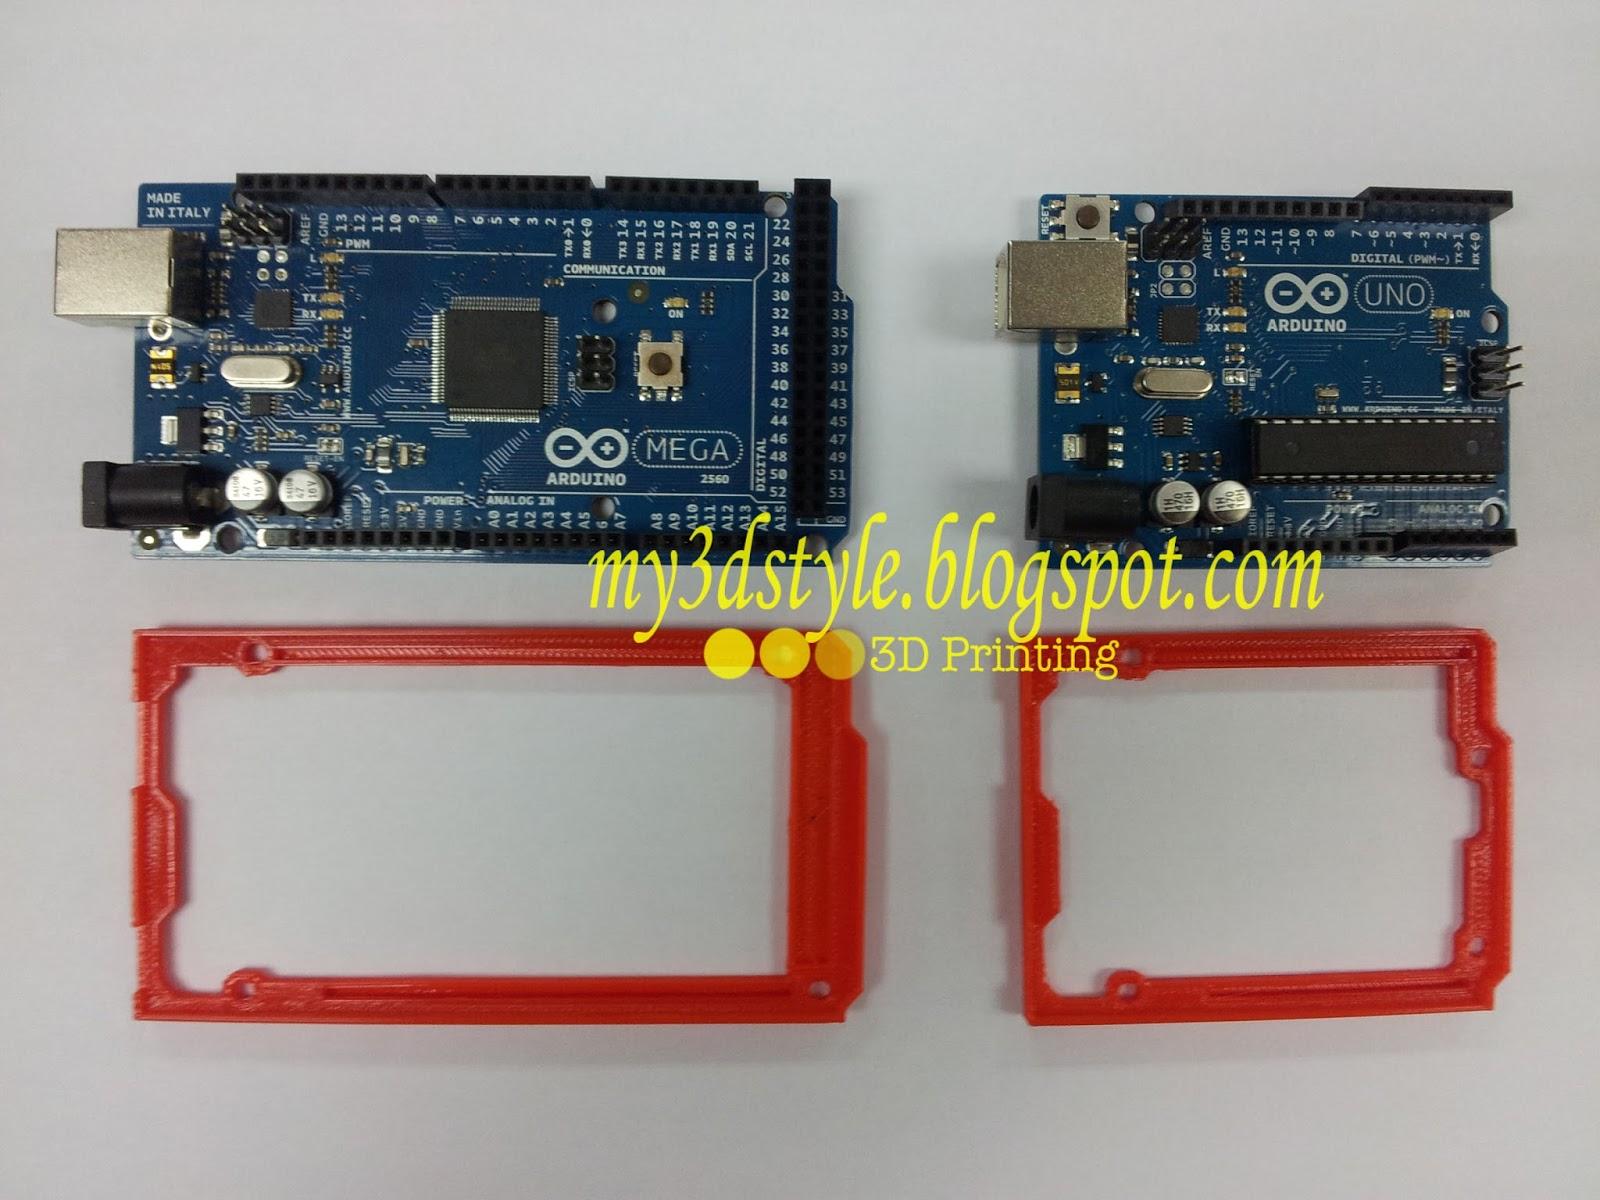 My d style arduino bumper case